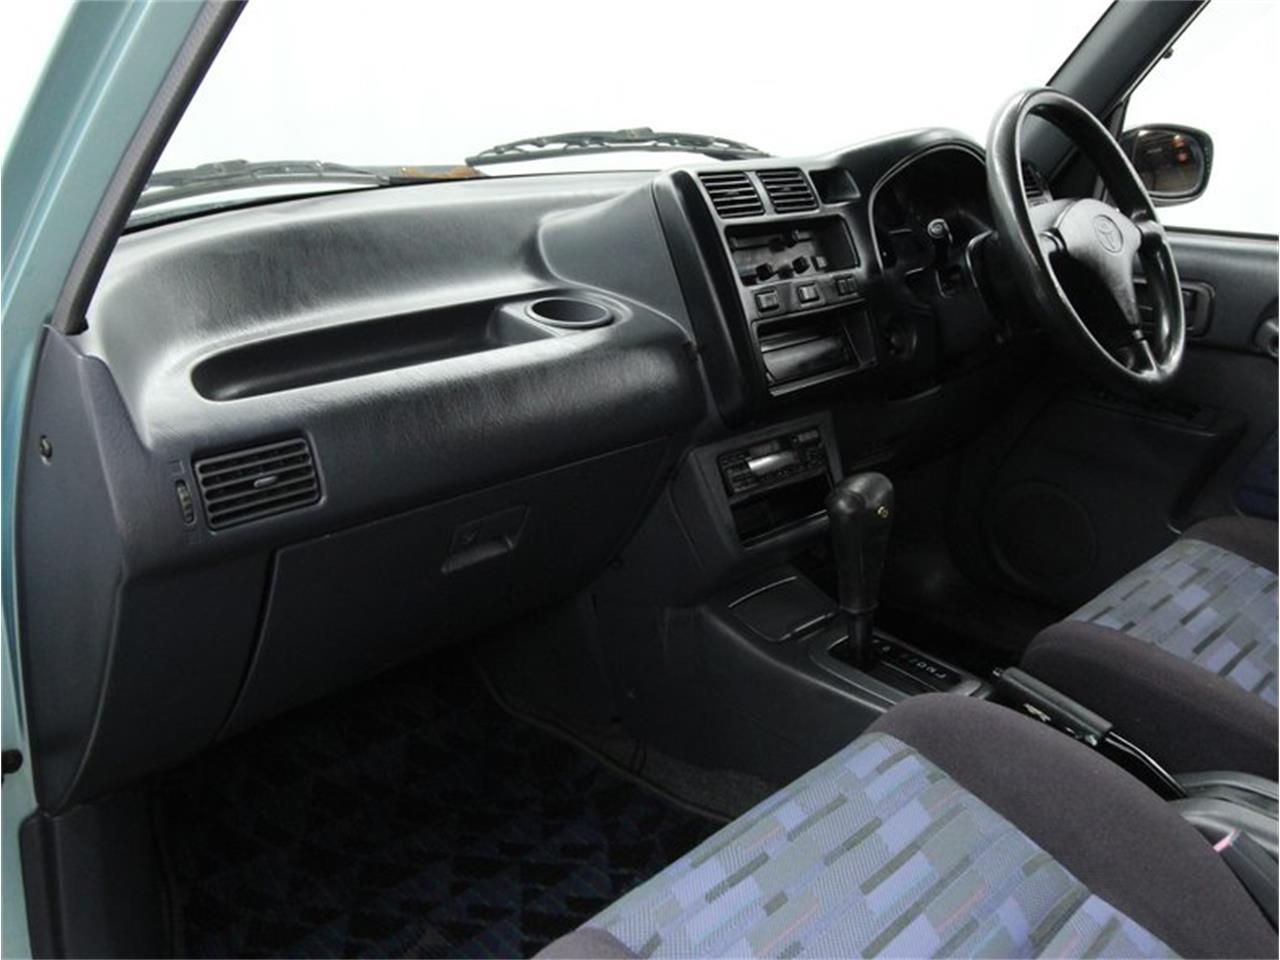 1995 Toyota Rav4 (CC-1419030) for sale in Christiansburg, Virginia